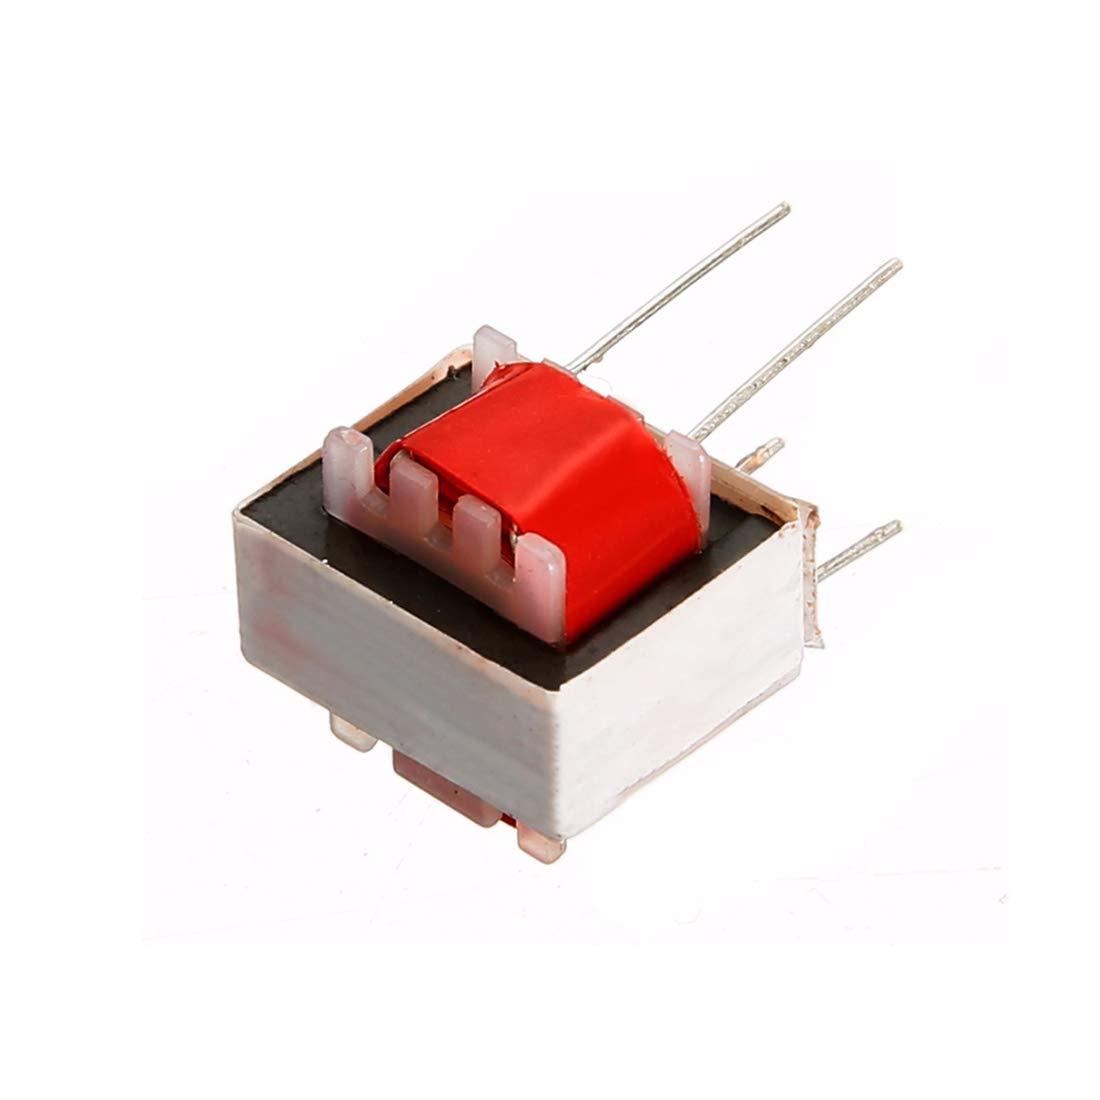 EI14//EI-14 Trasformatore audio per accoppiamento audio 600:600 1:1